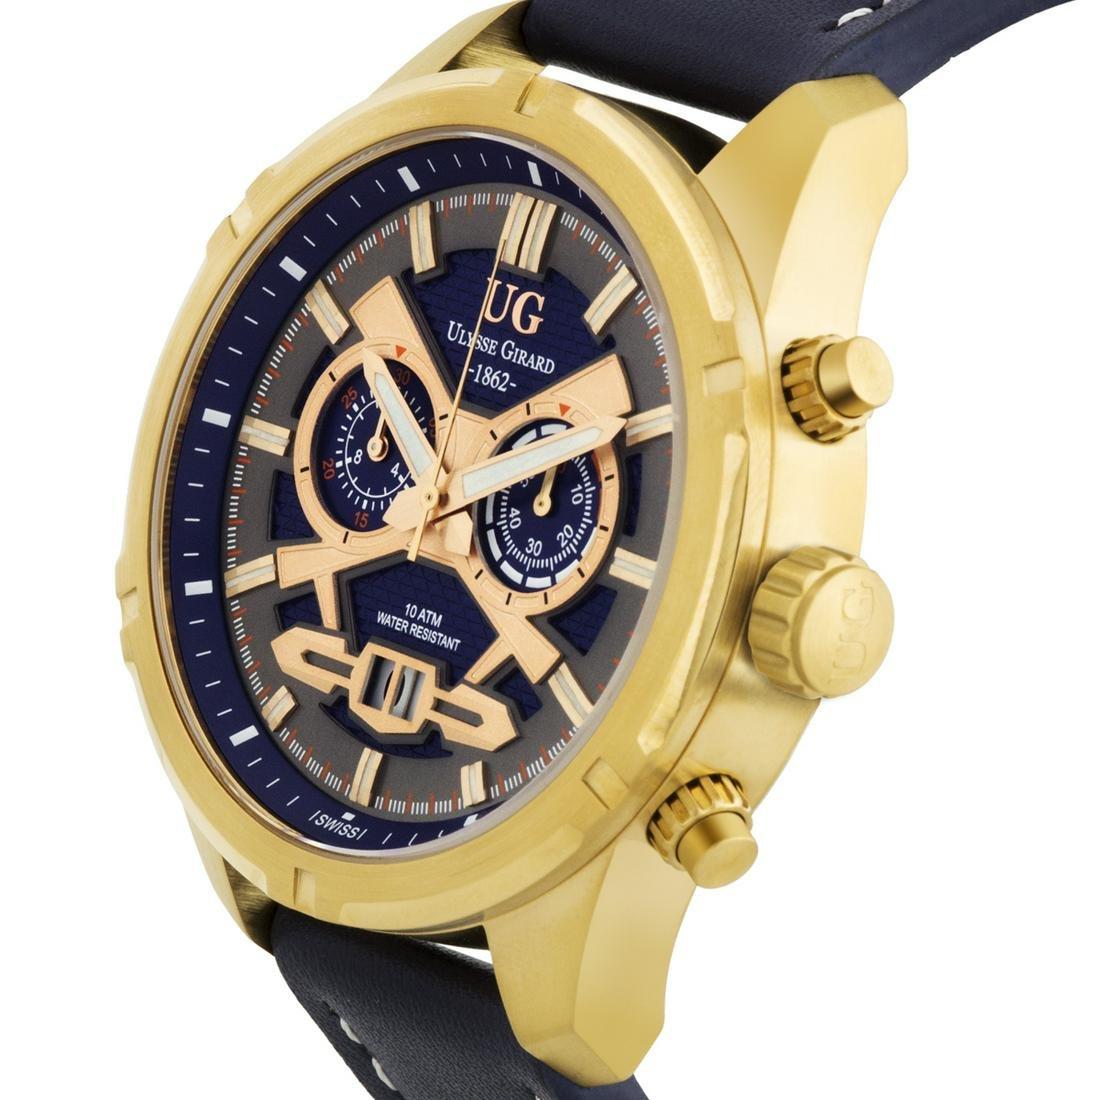 Ulysse Girard Men's Swiss Chronograph Watch